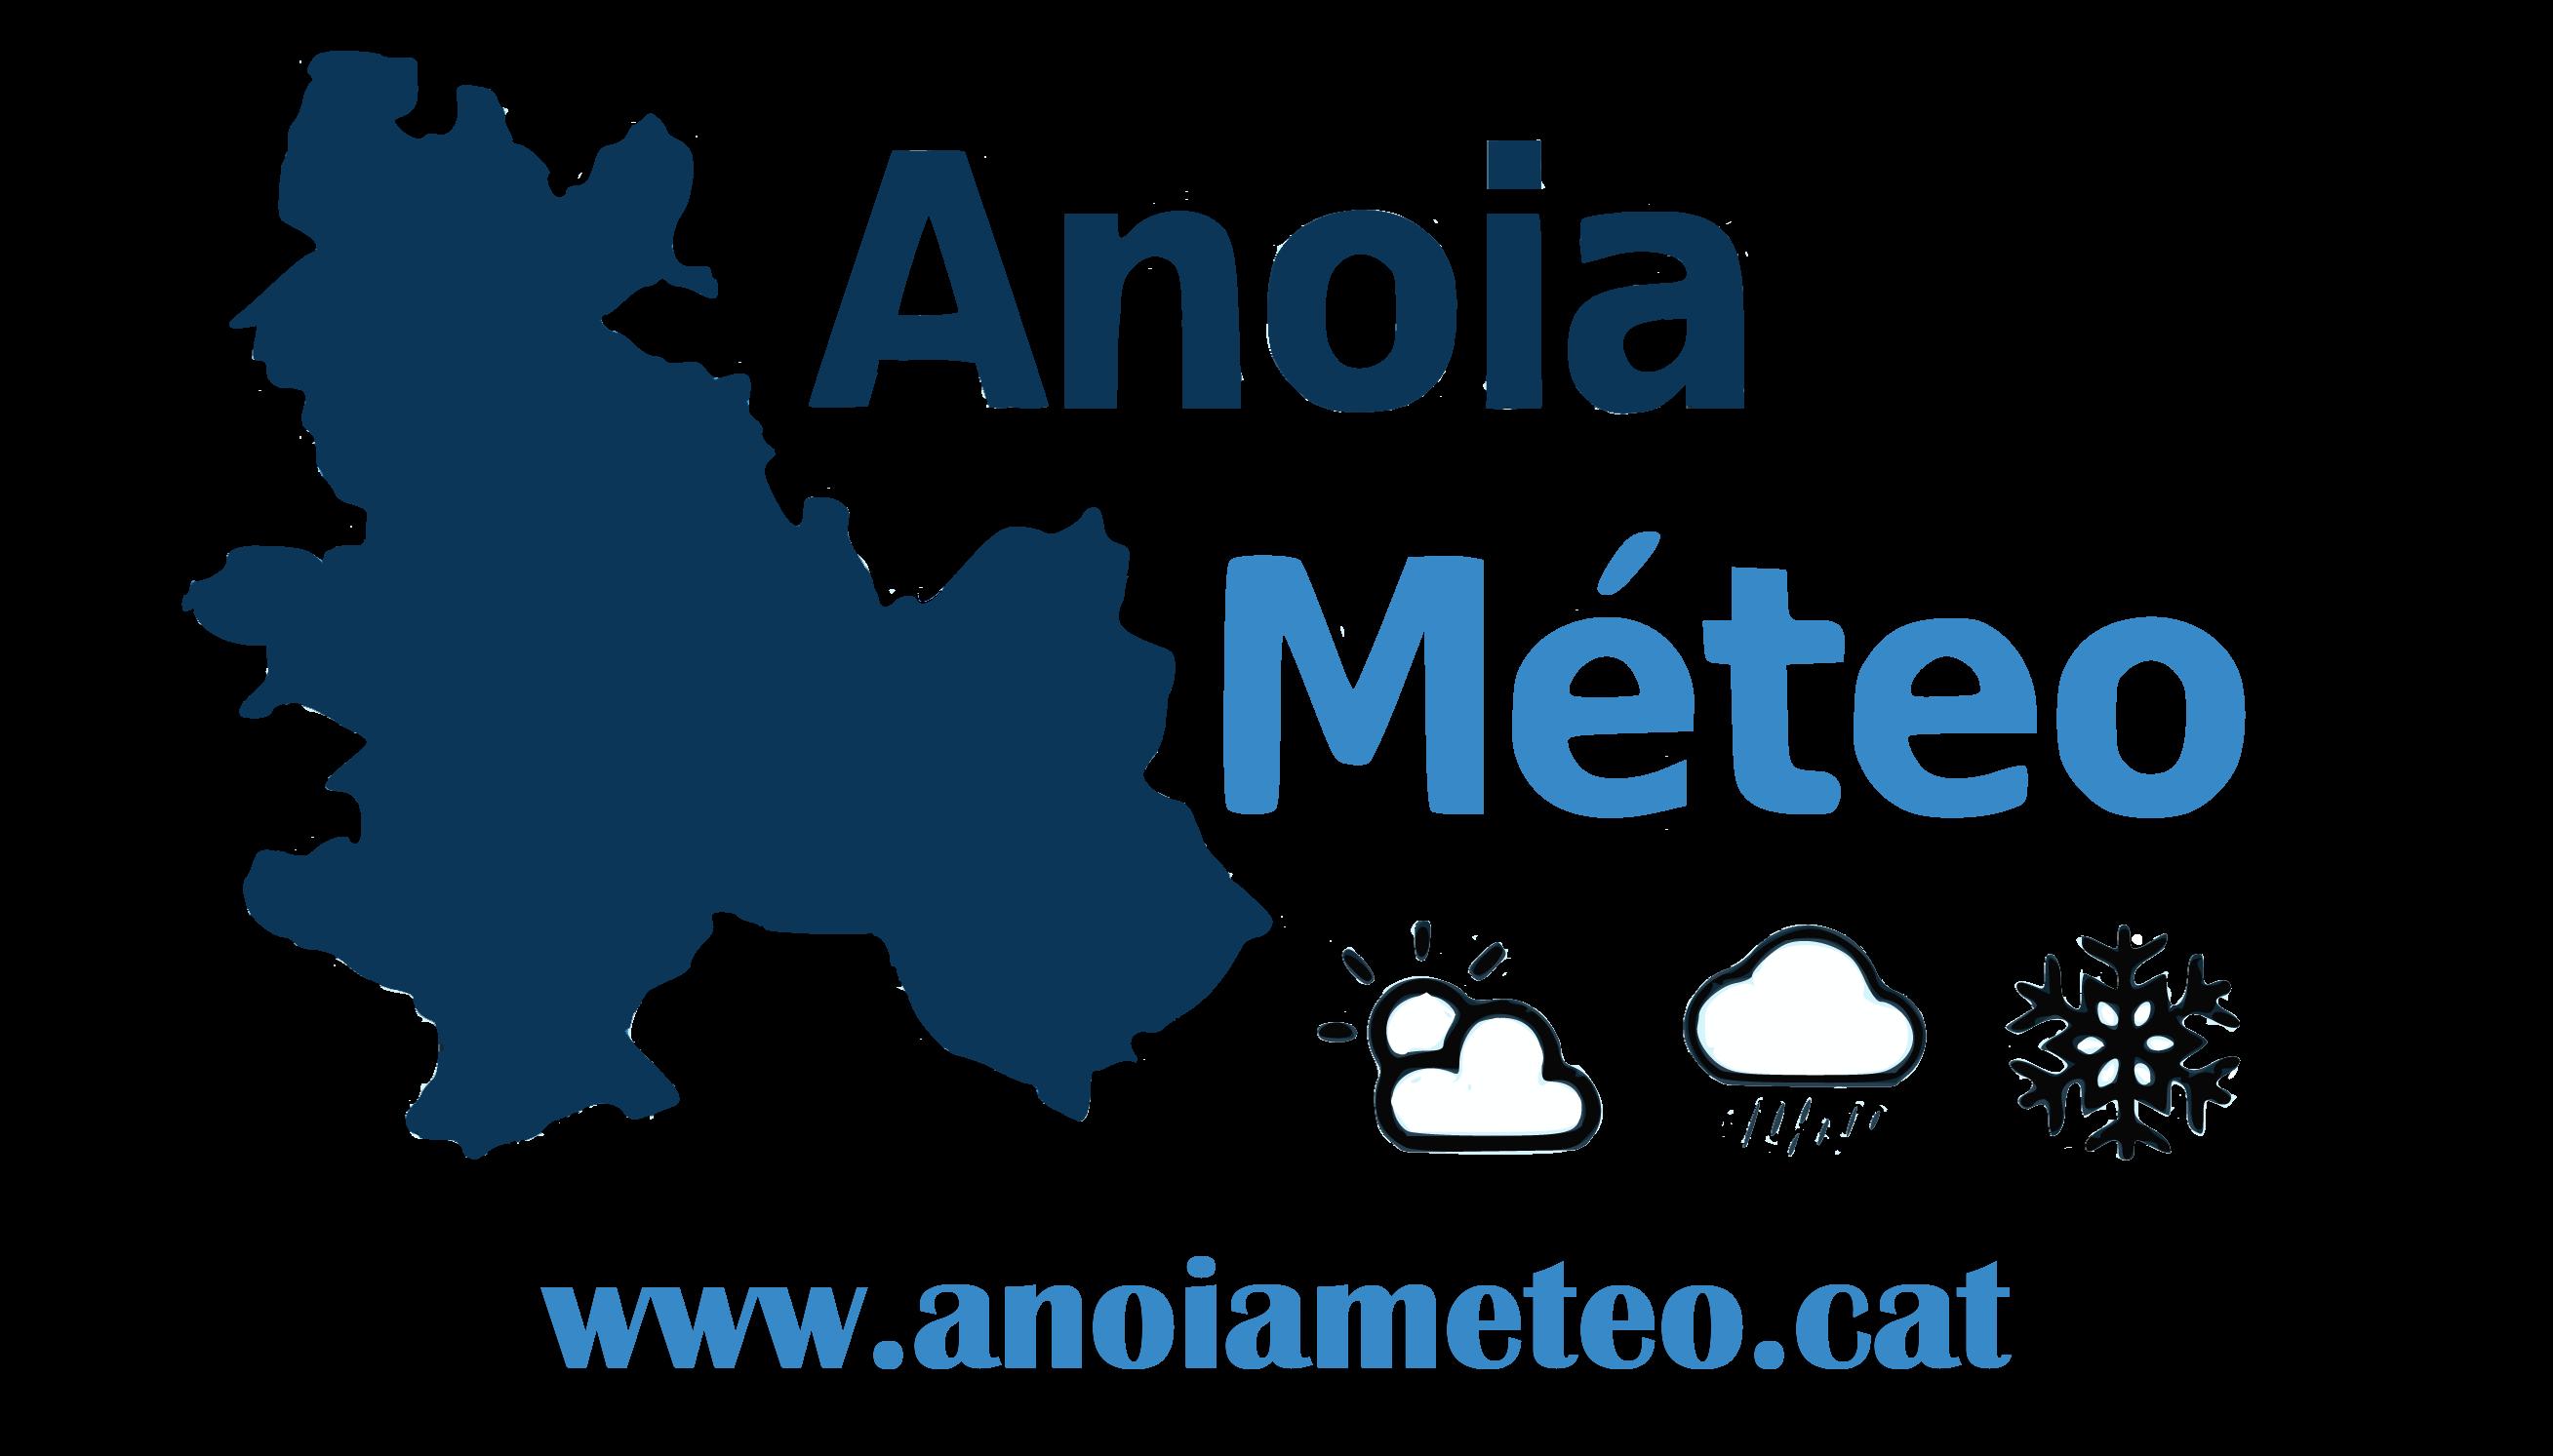 AnoiaMeteo